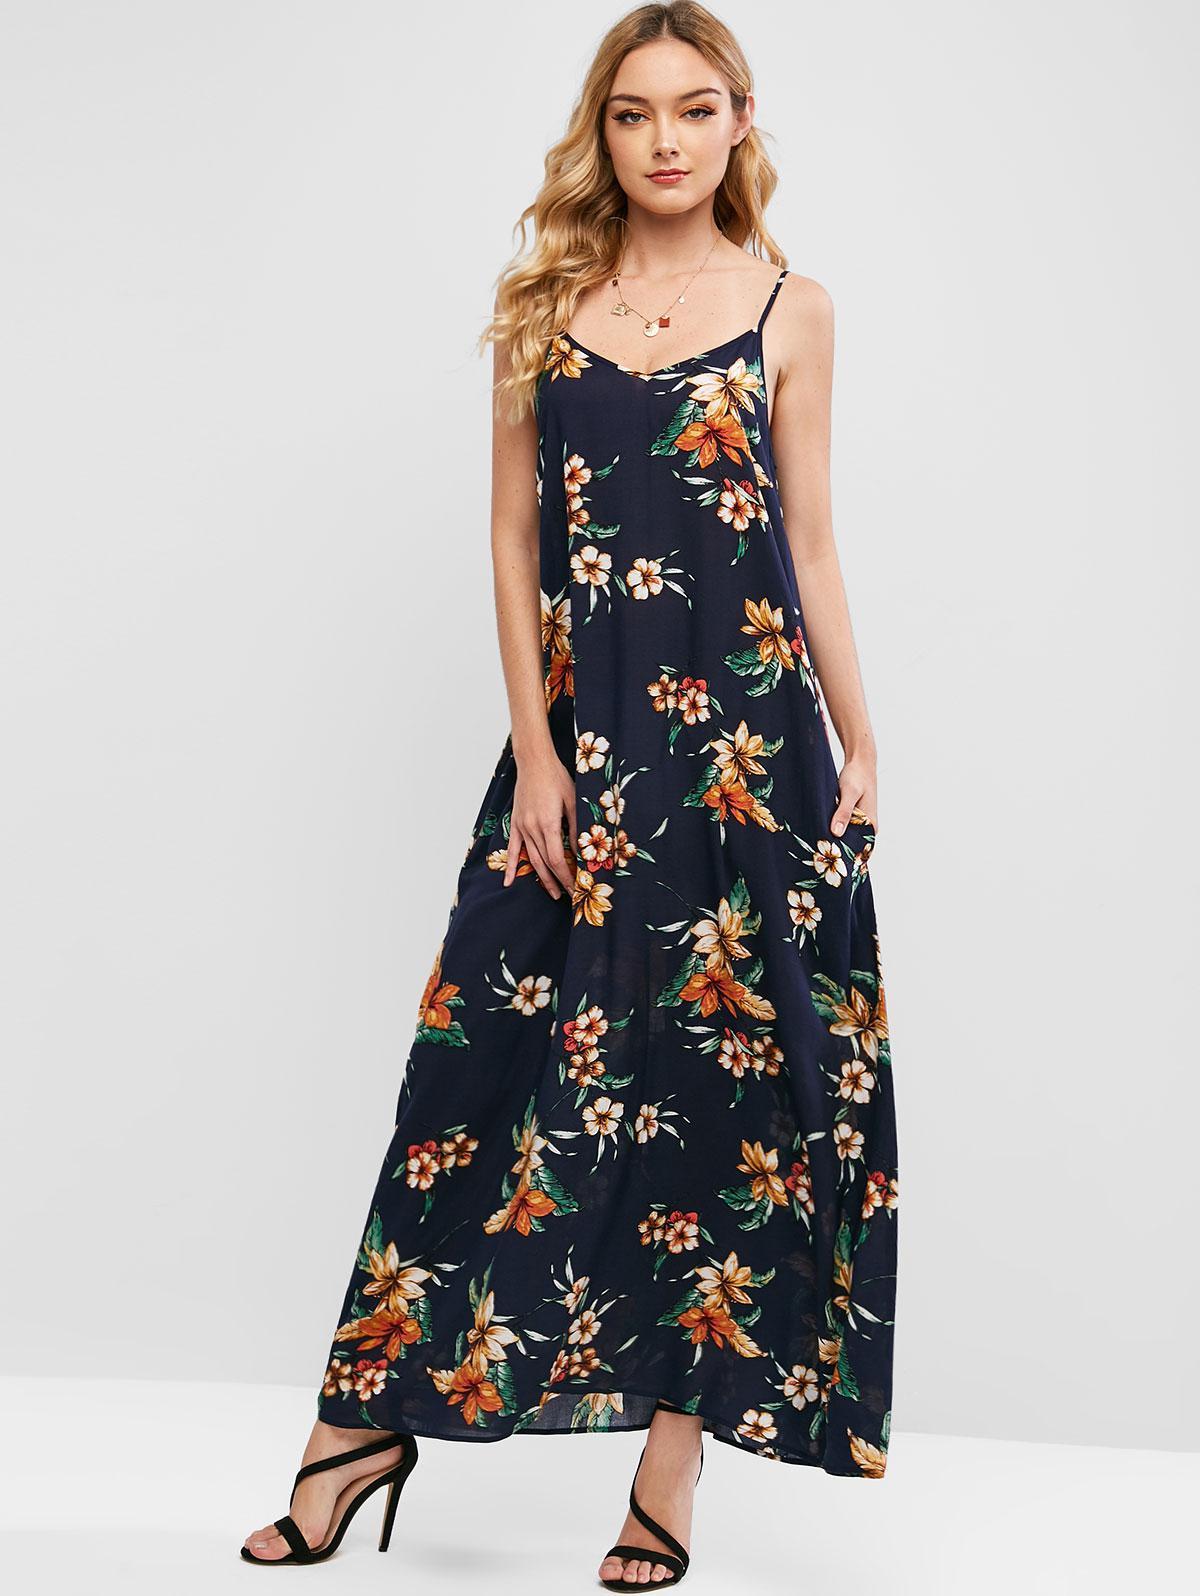 ZAFUL Cami Seam Pockets Floral Maxi Dress